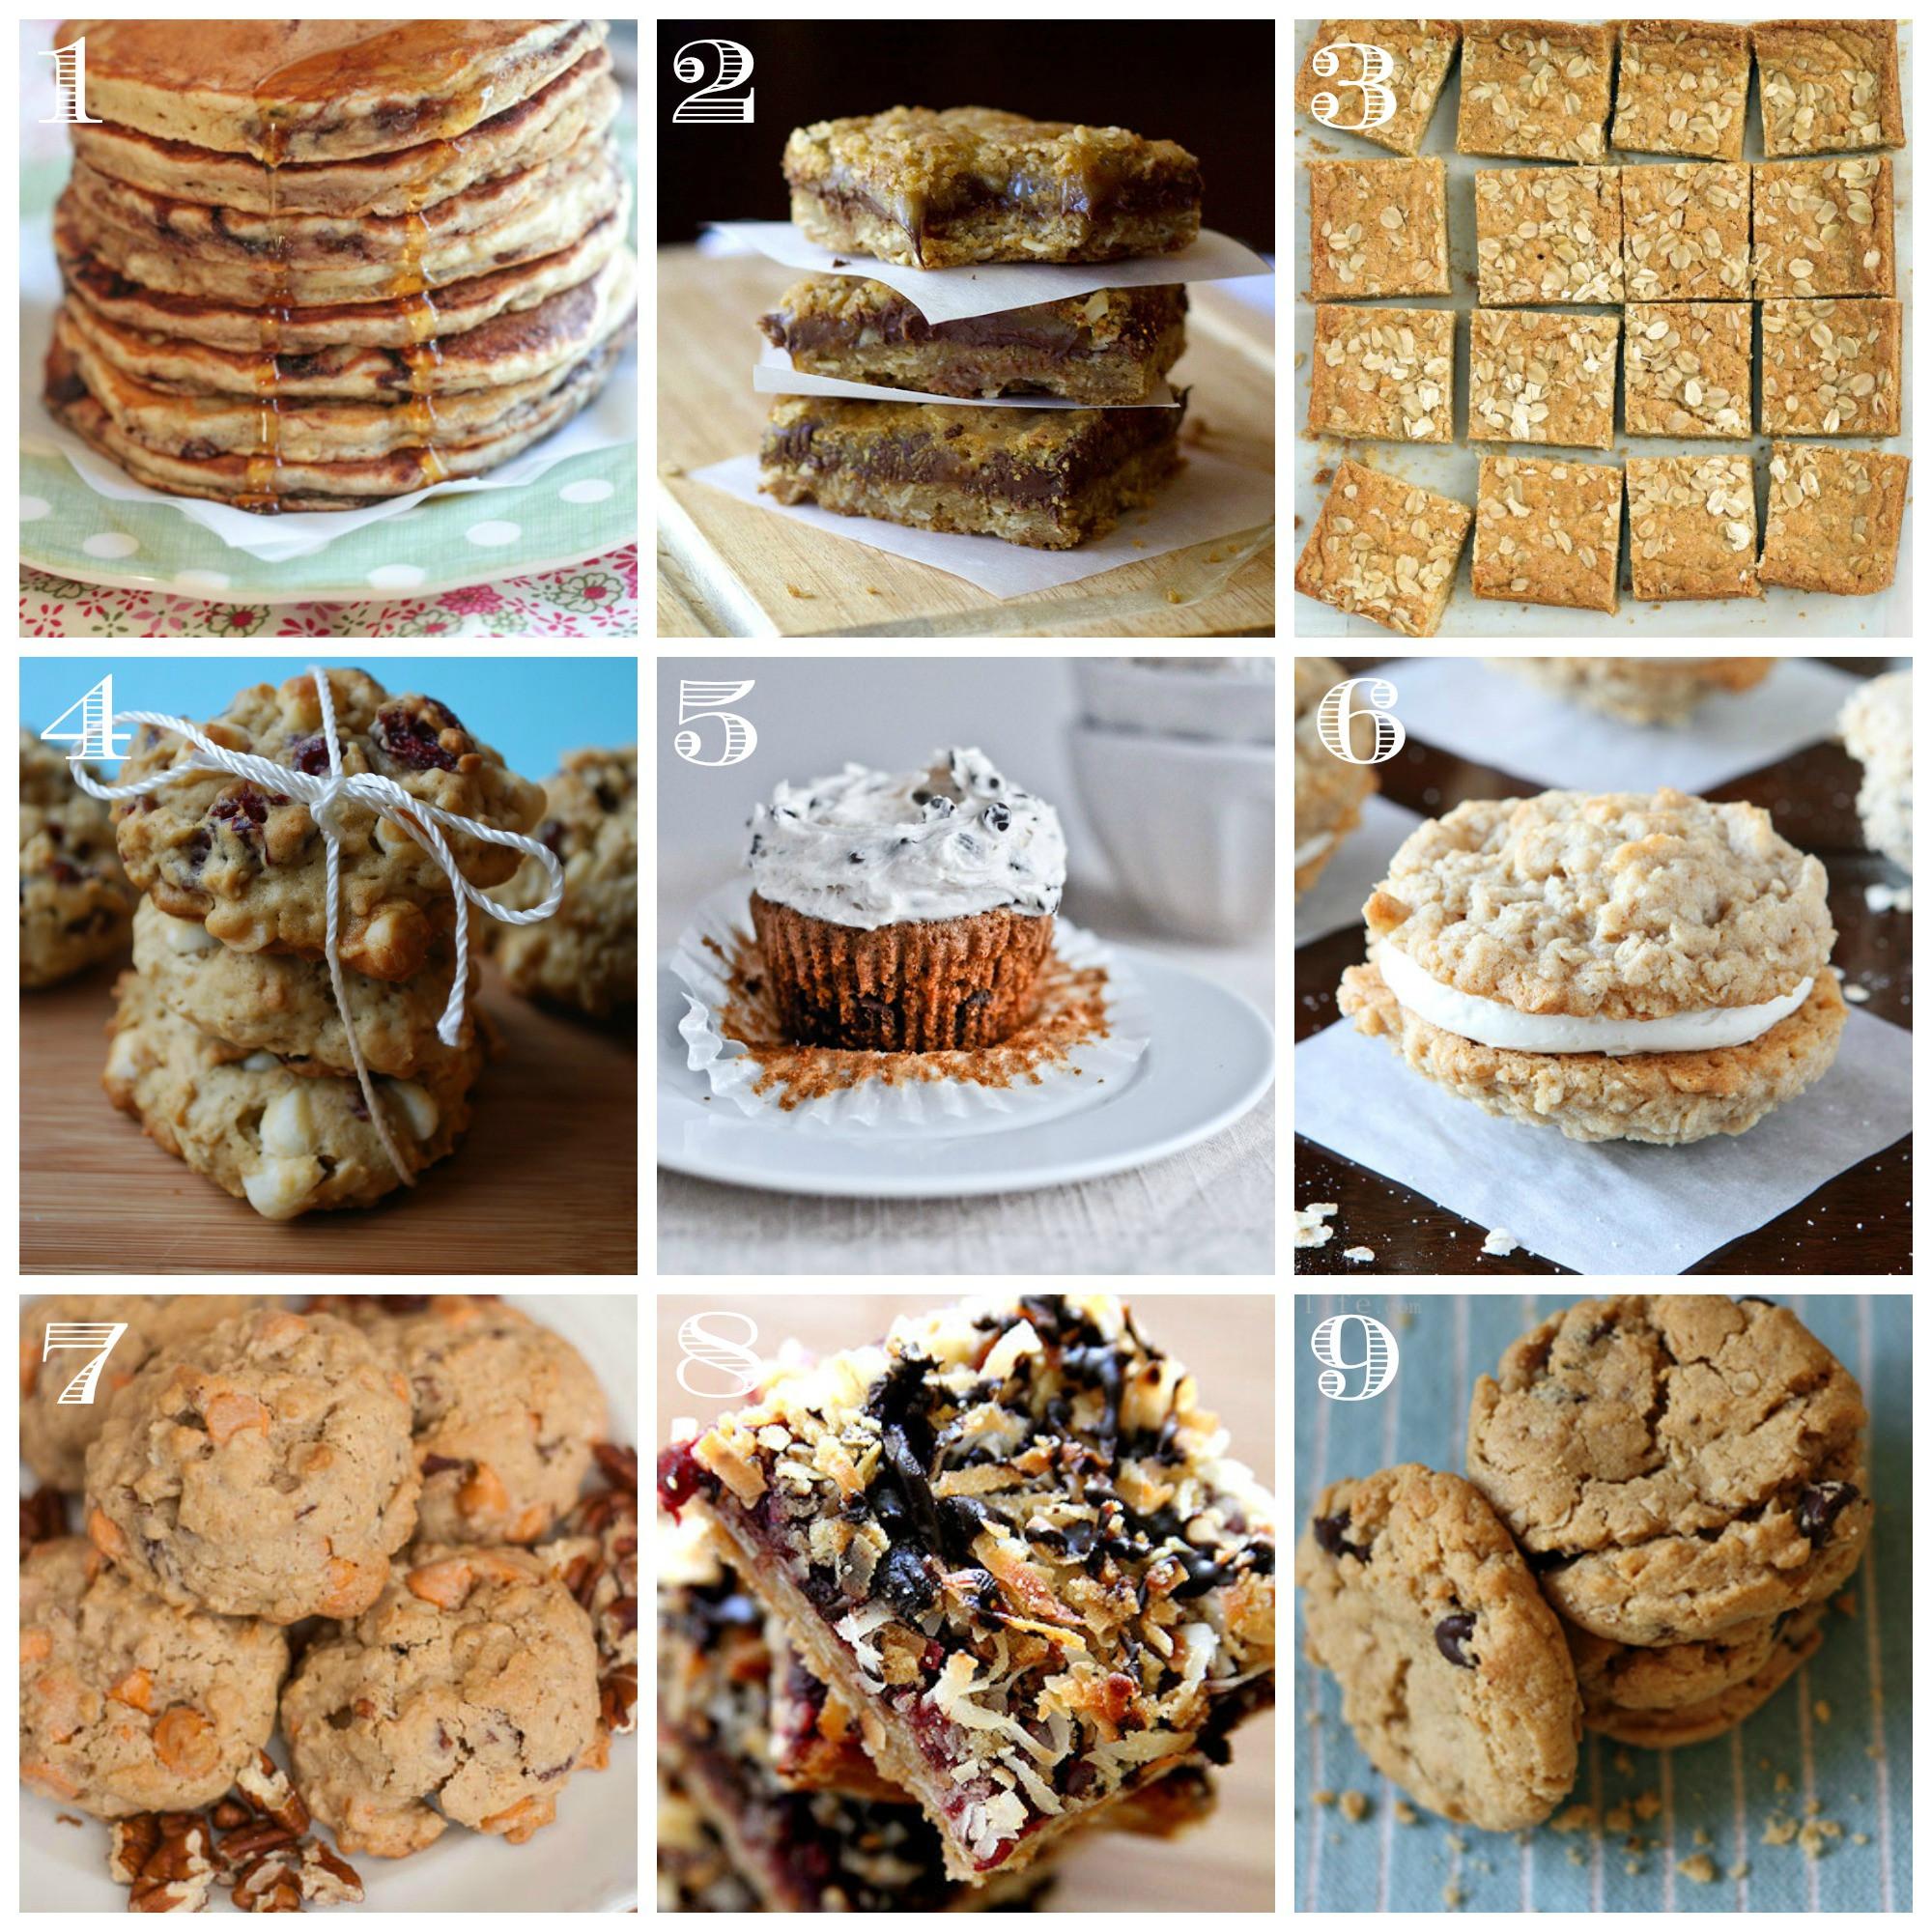 Oatmeal Dessert Recipes  Best oatmeal dessert recipes • CakeJournal